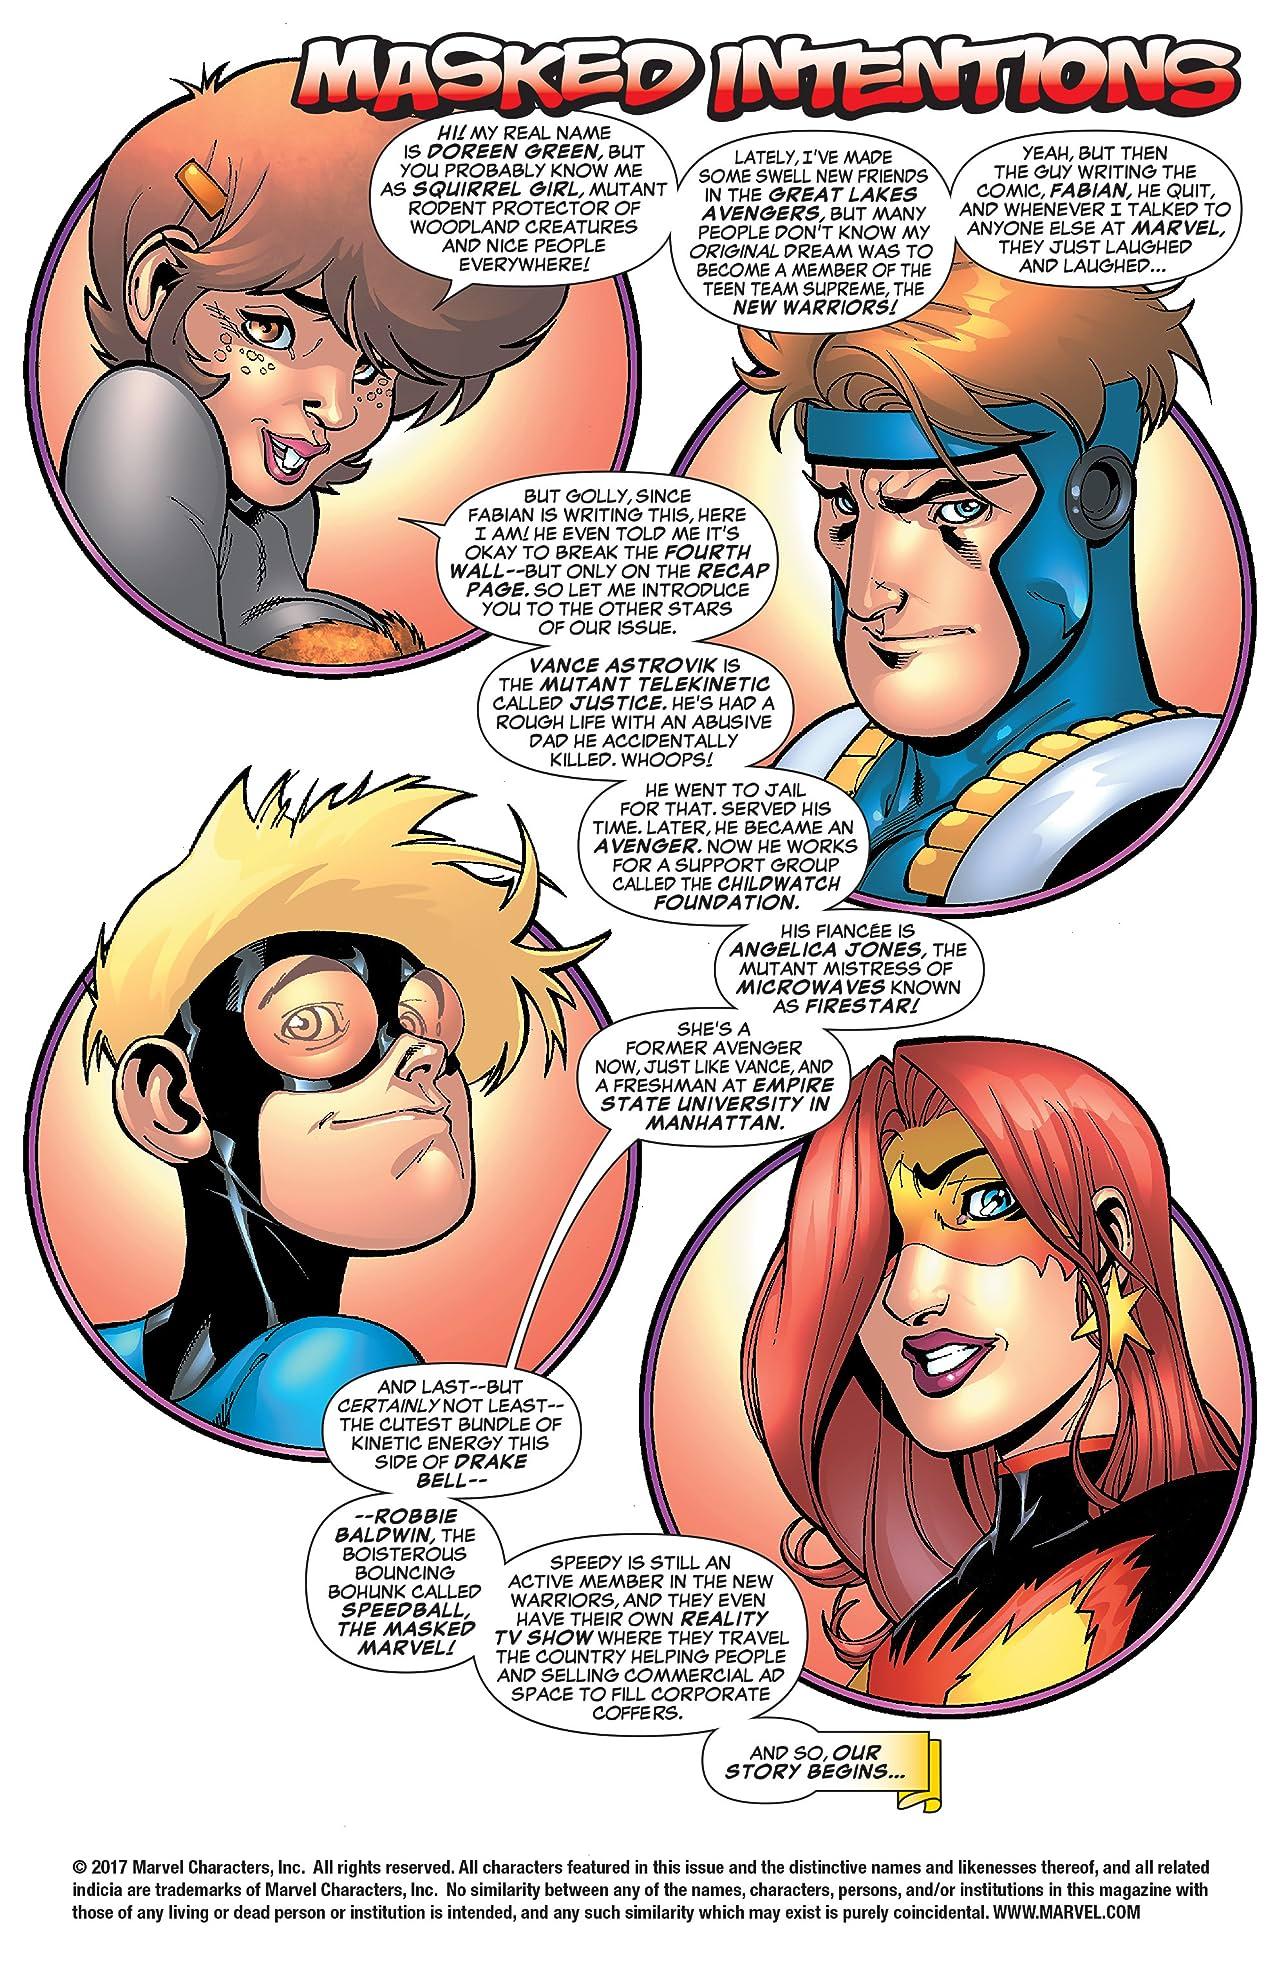 I (heart) Marvel (2006): Masked Intentions #1